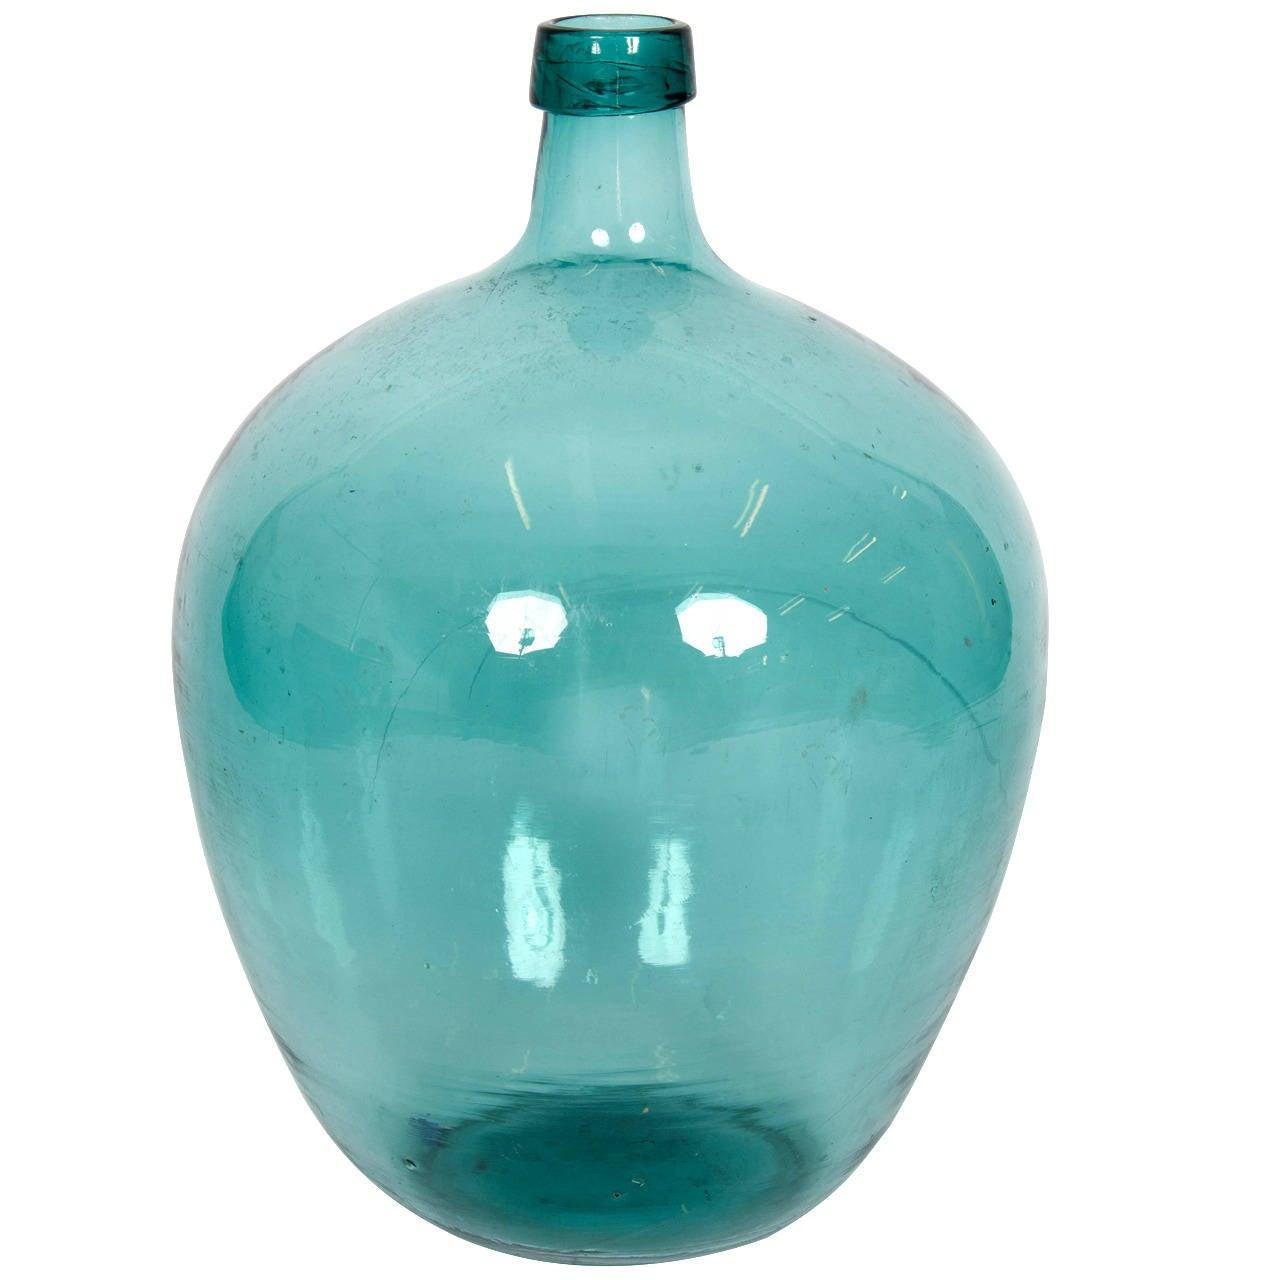 Early 20th Century Blue Demijohn Glass Bottle At 1stdibs